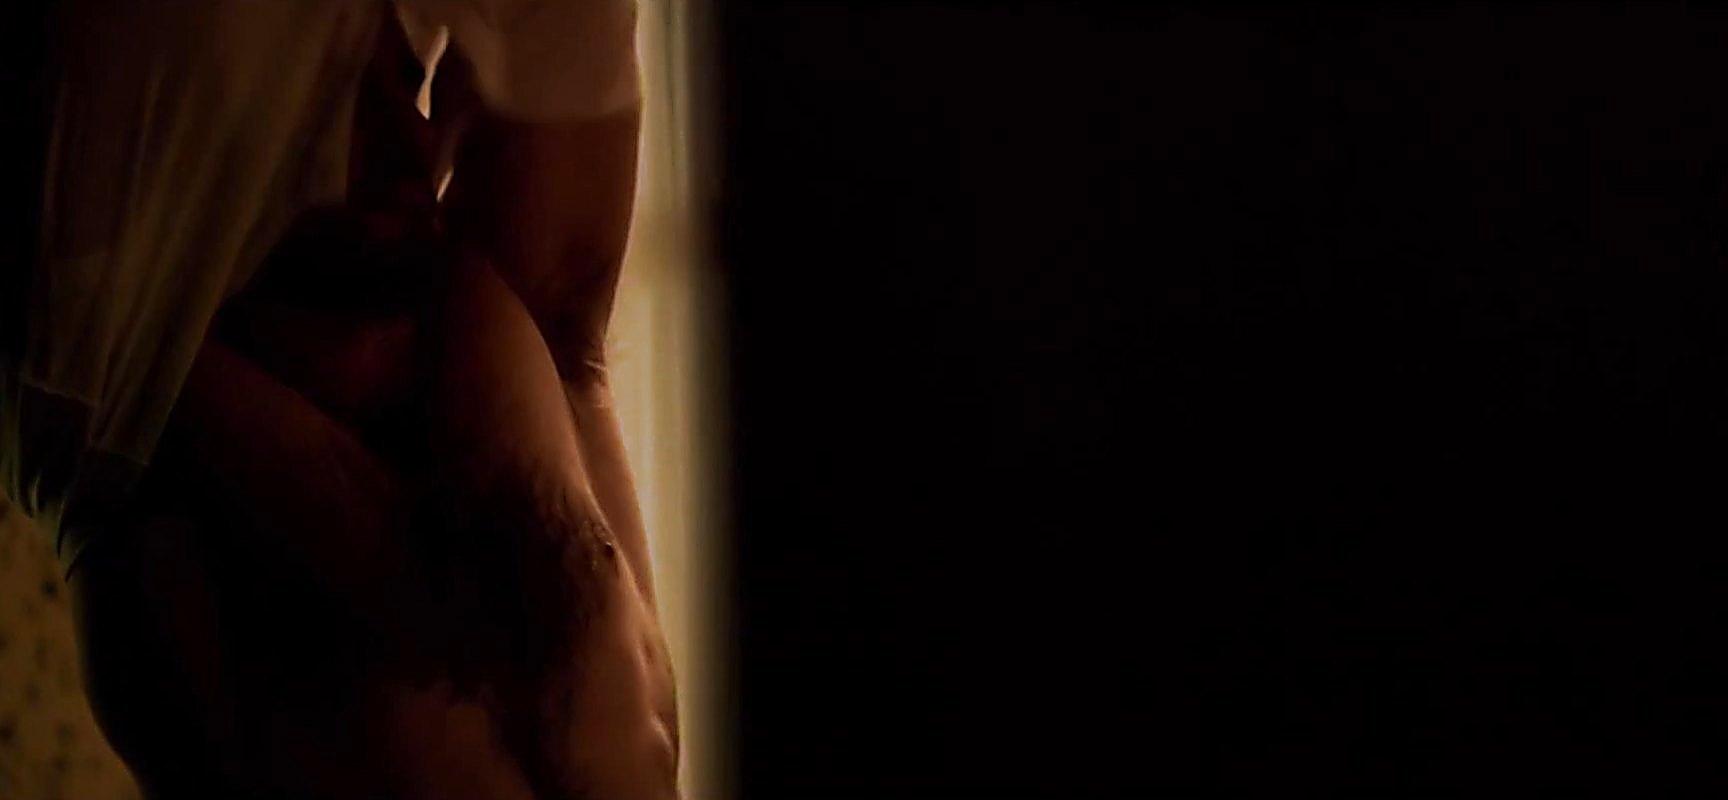 Colin O Donoghue sexy shirtless scene January 26, 2015, 8pm